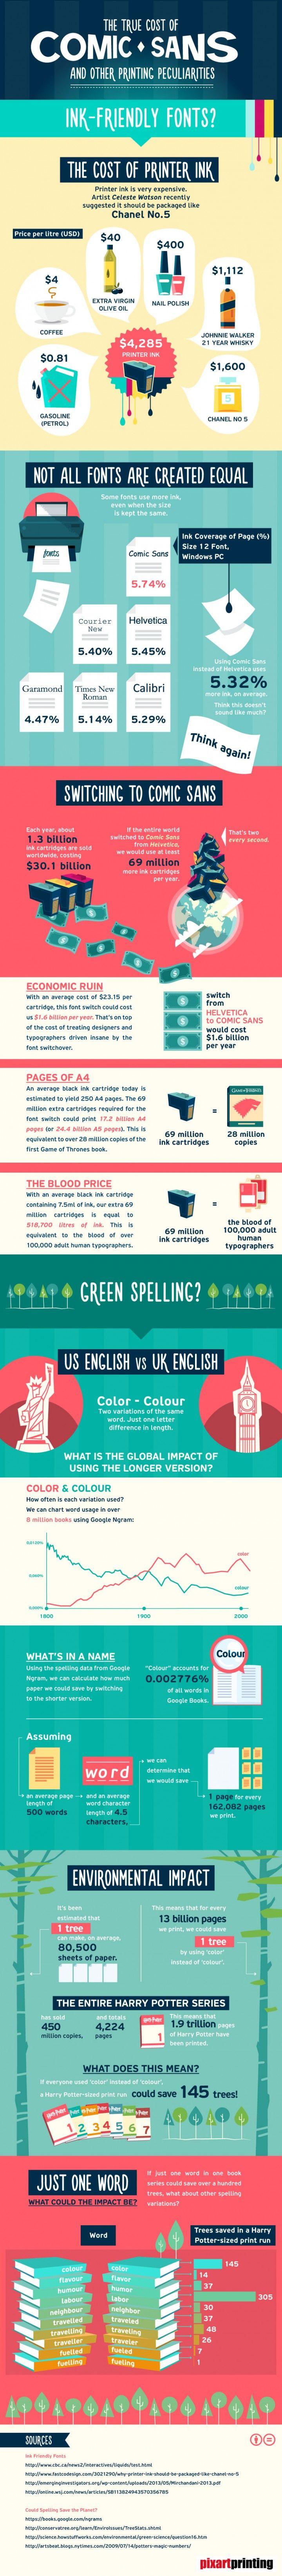 The true cost of Comic Sans!